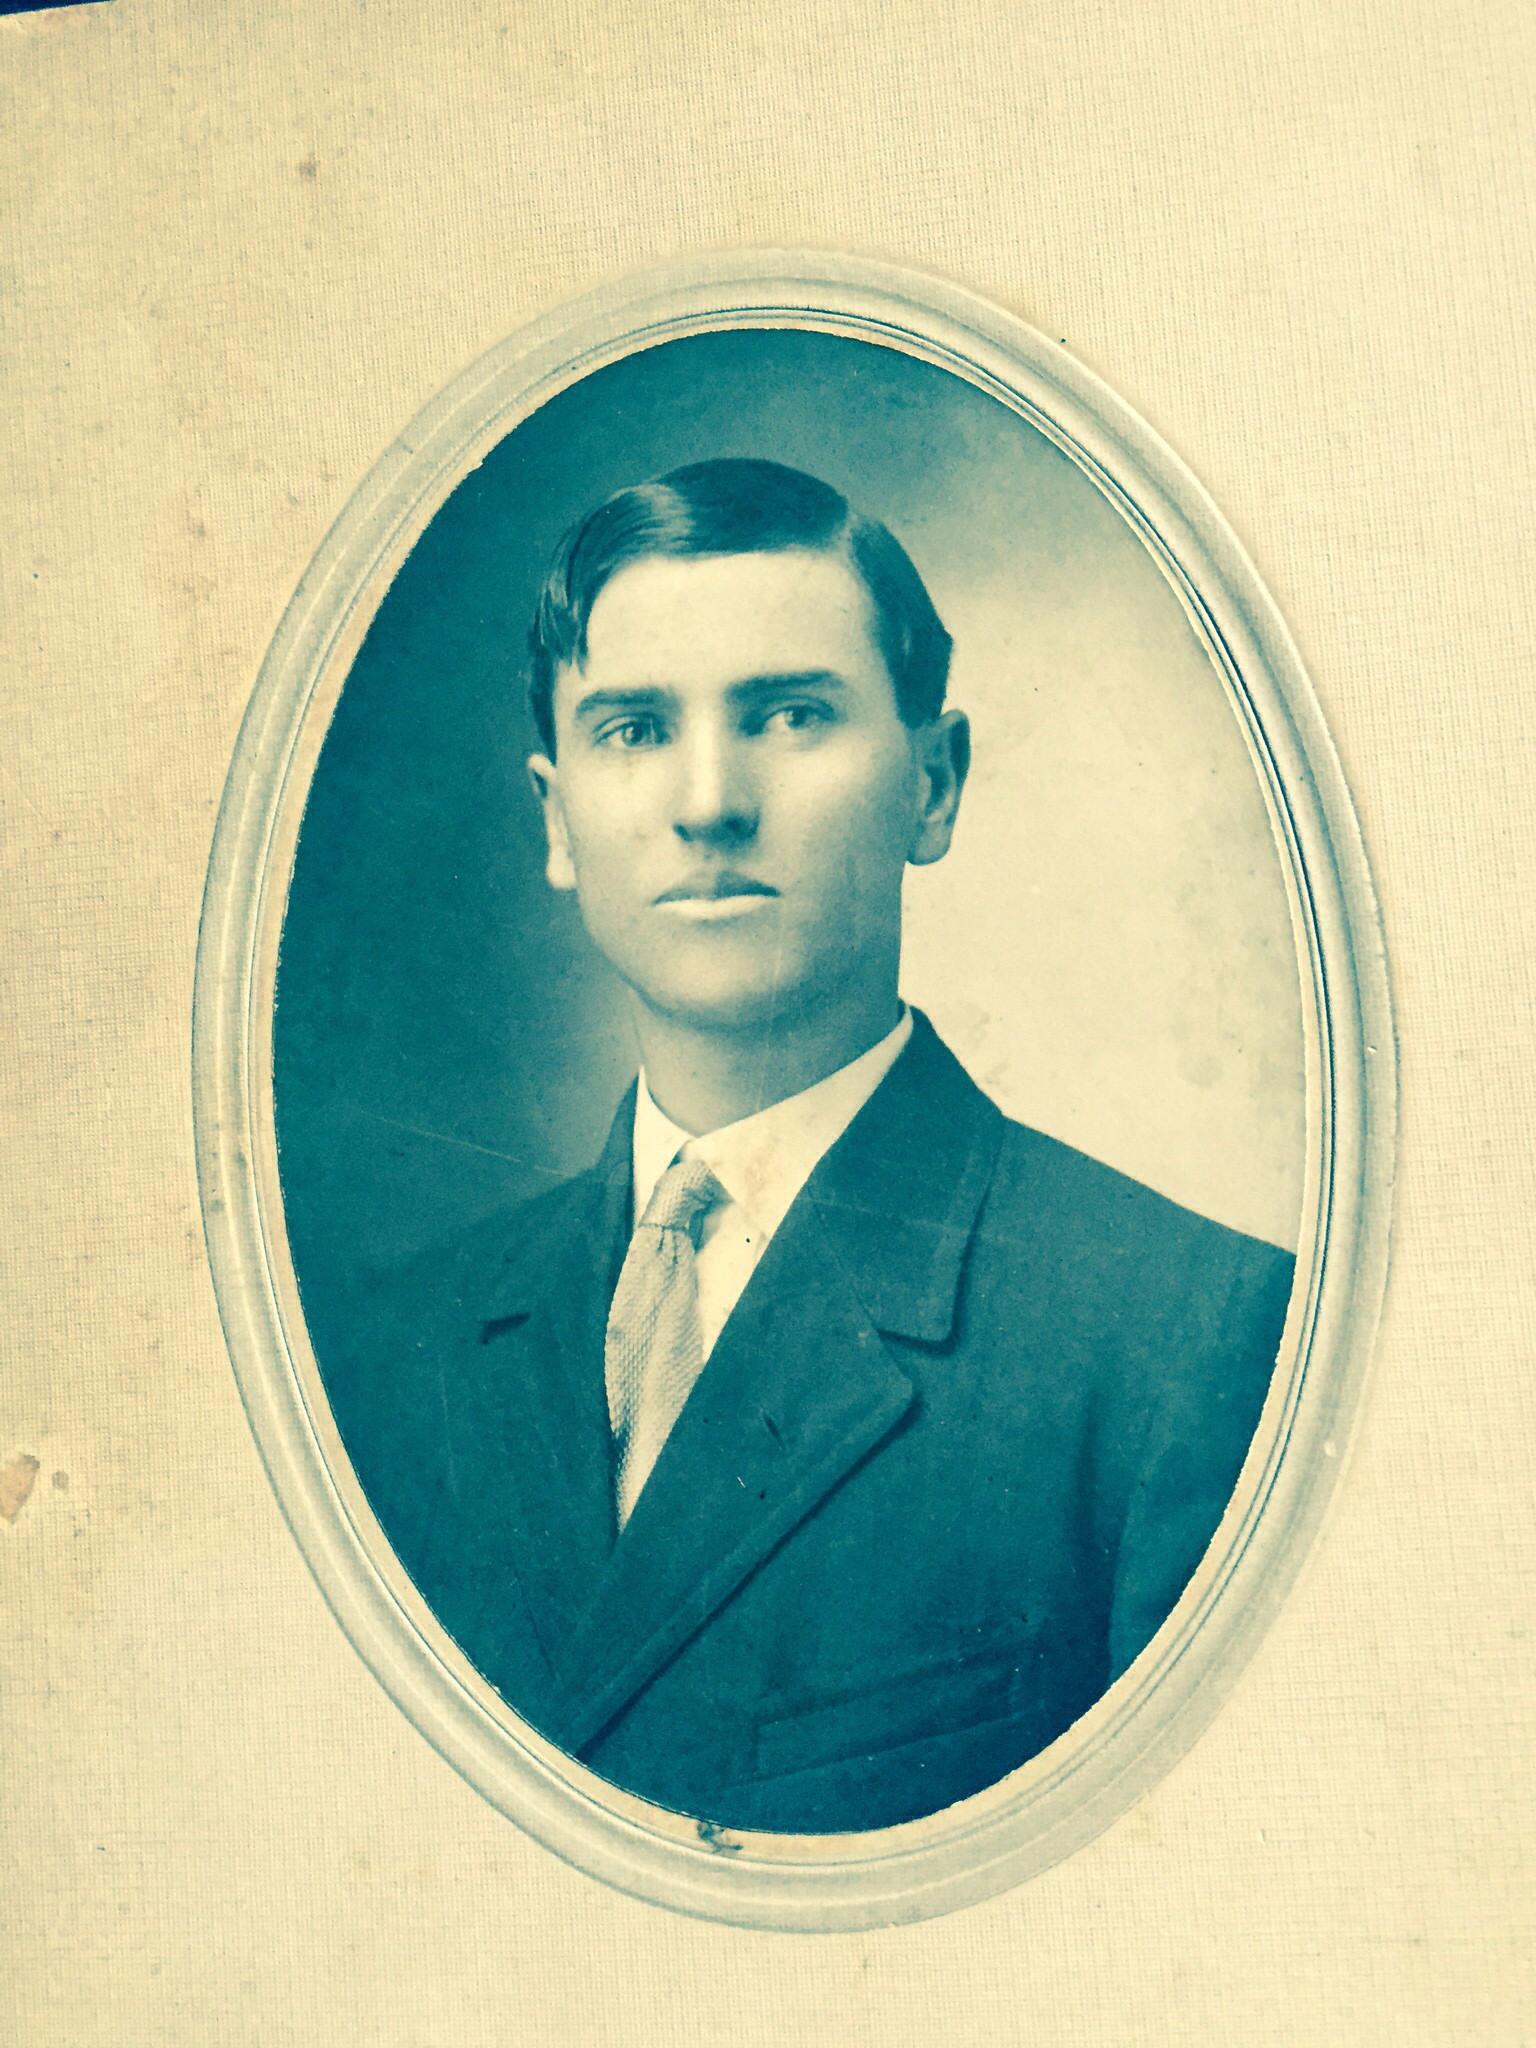 Sheriff Lorie James Mangham, Sr. | Lamar County Sheriff's Office, Georgia